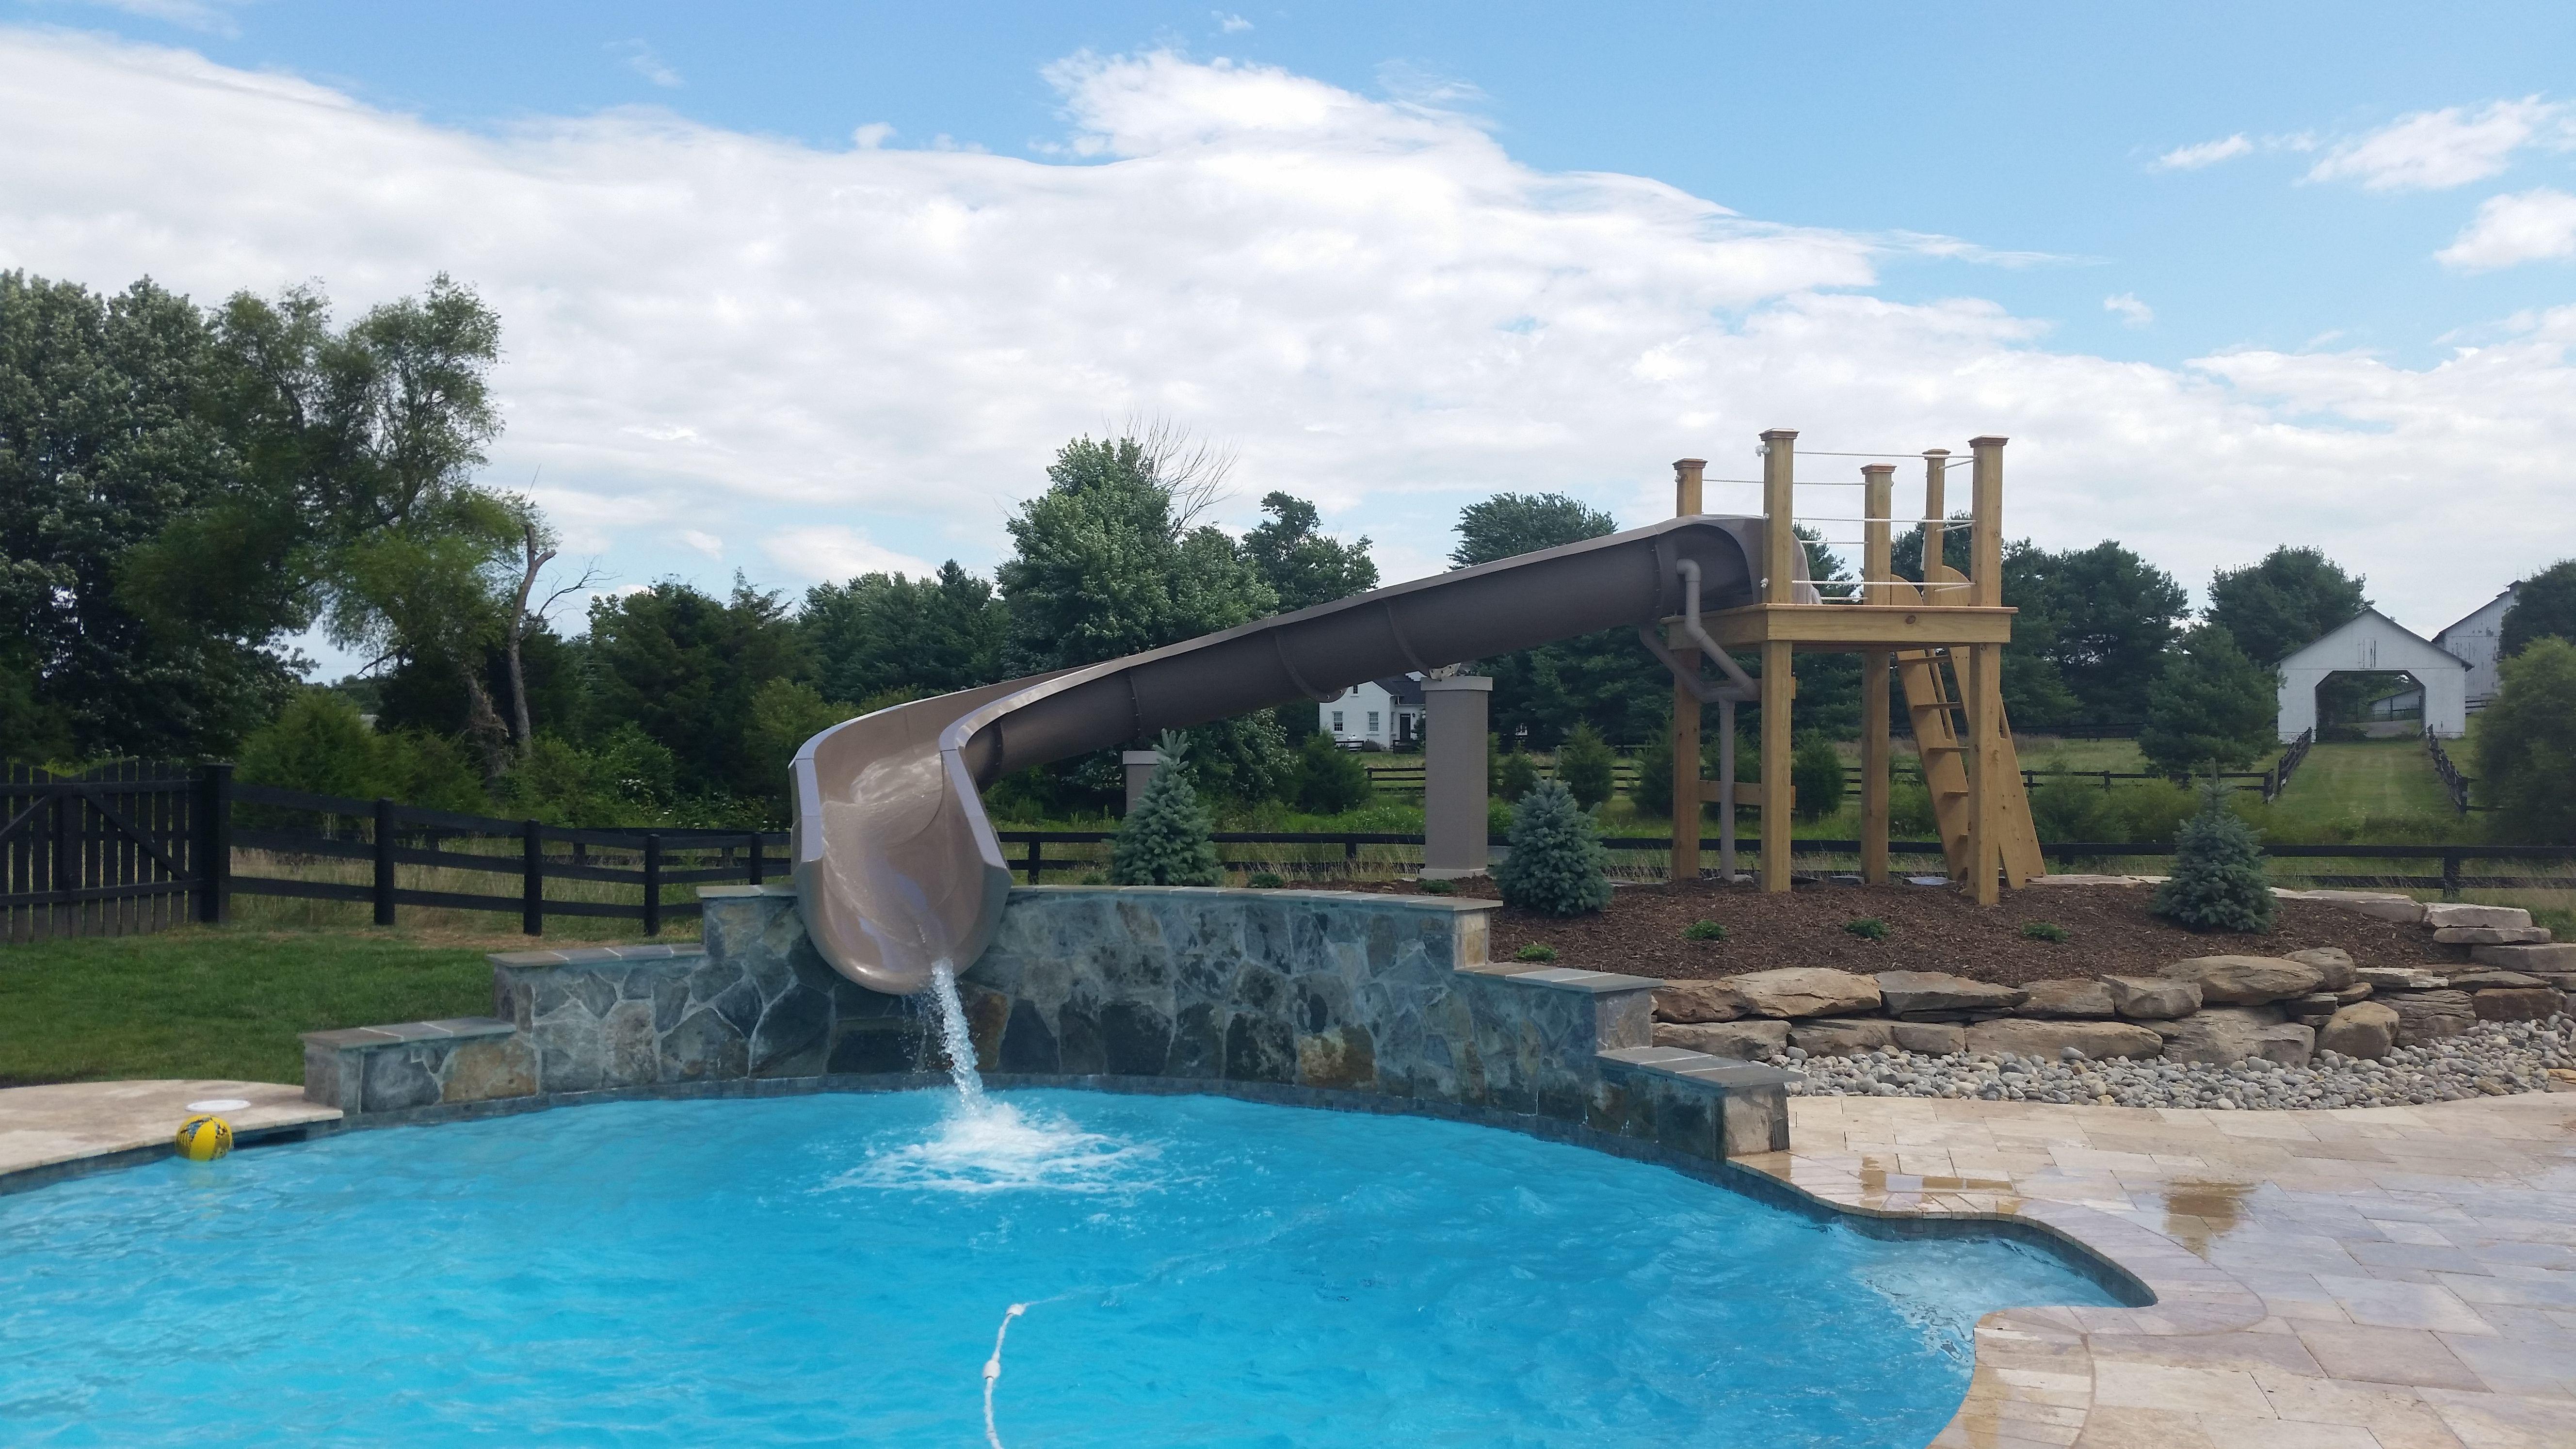 Commercial Grade Fiberglass Water Slides Custom Made For Your Home